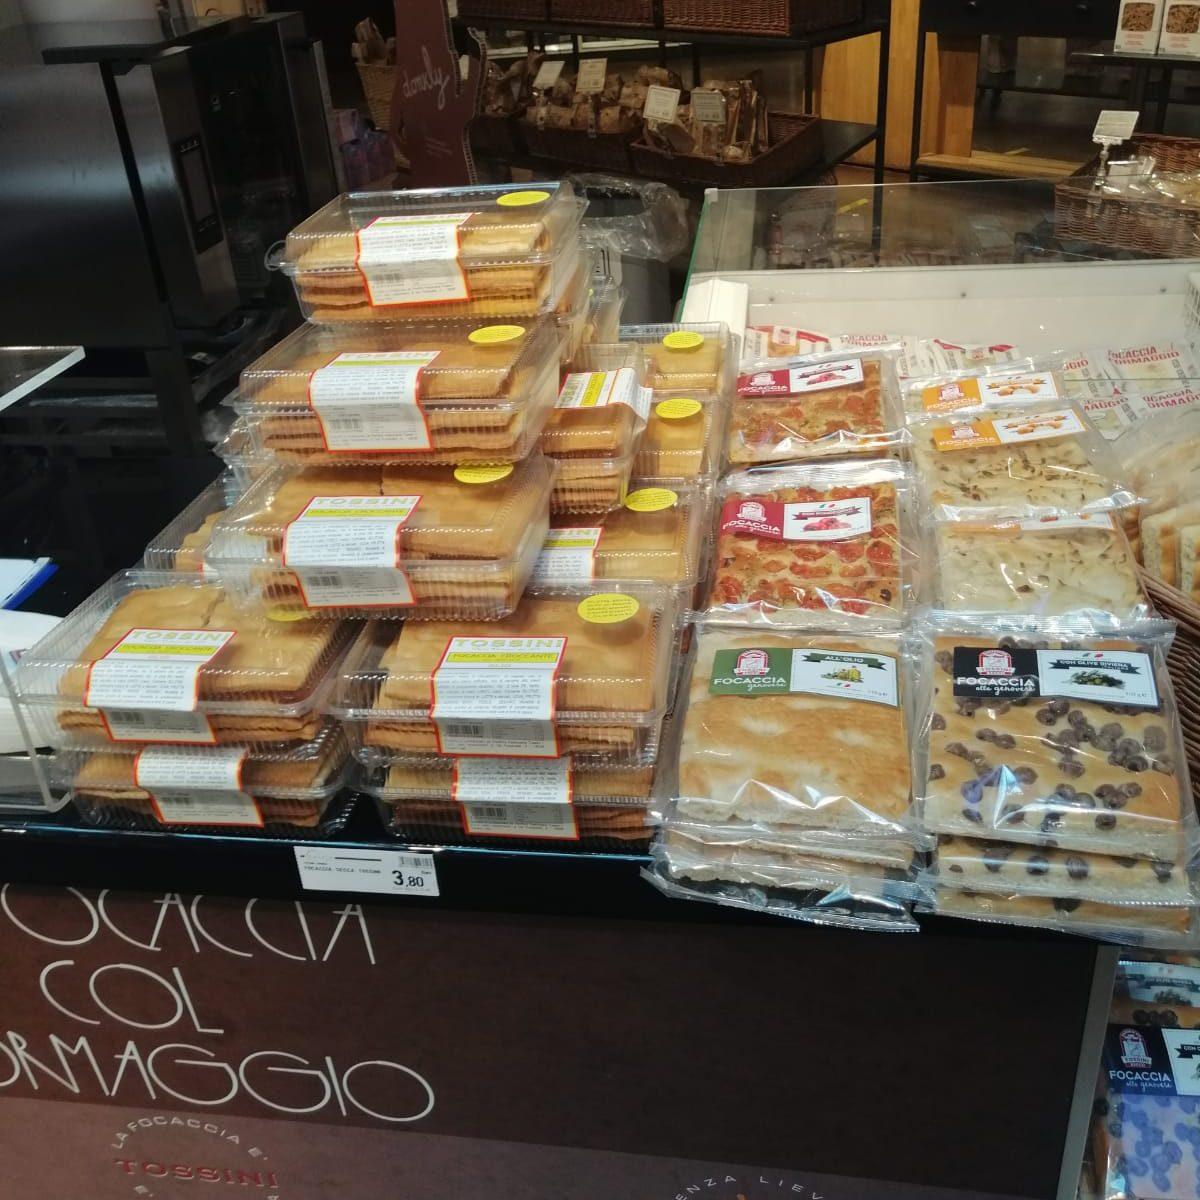 Corner Tossini -Eataly Store Milano Smeraldo (5)